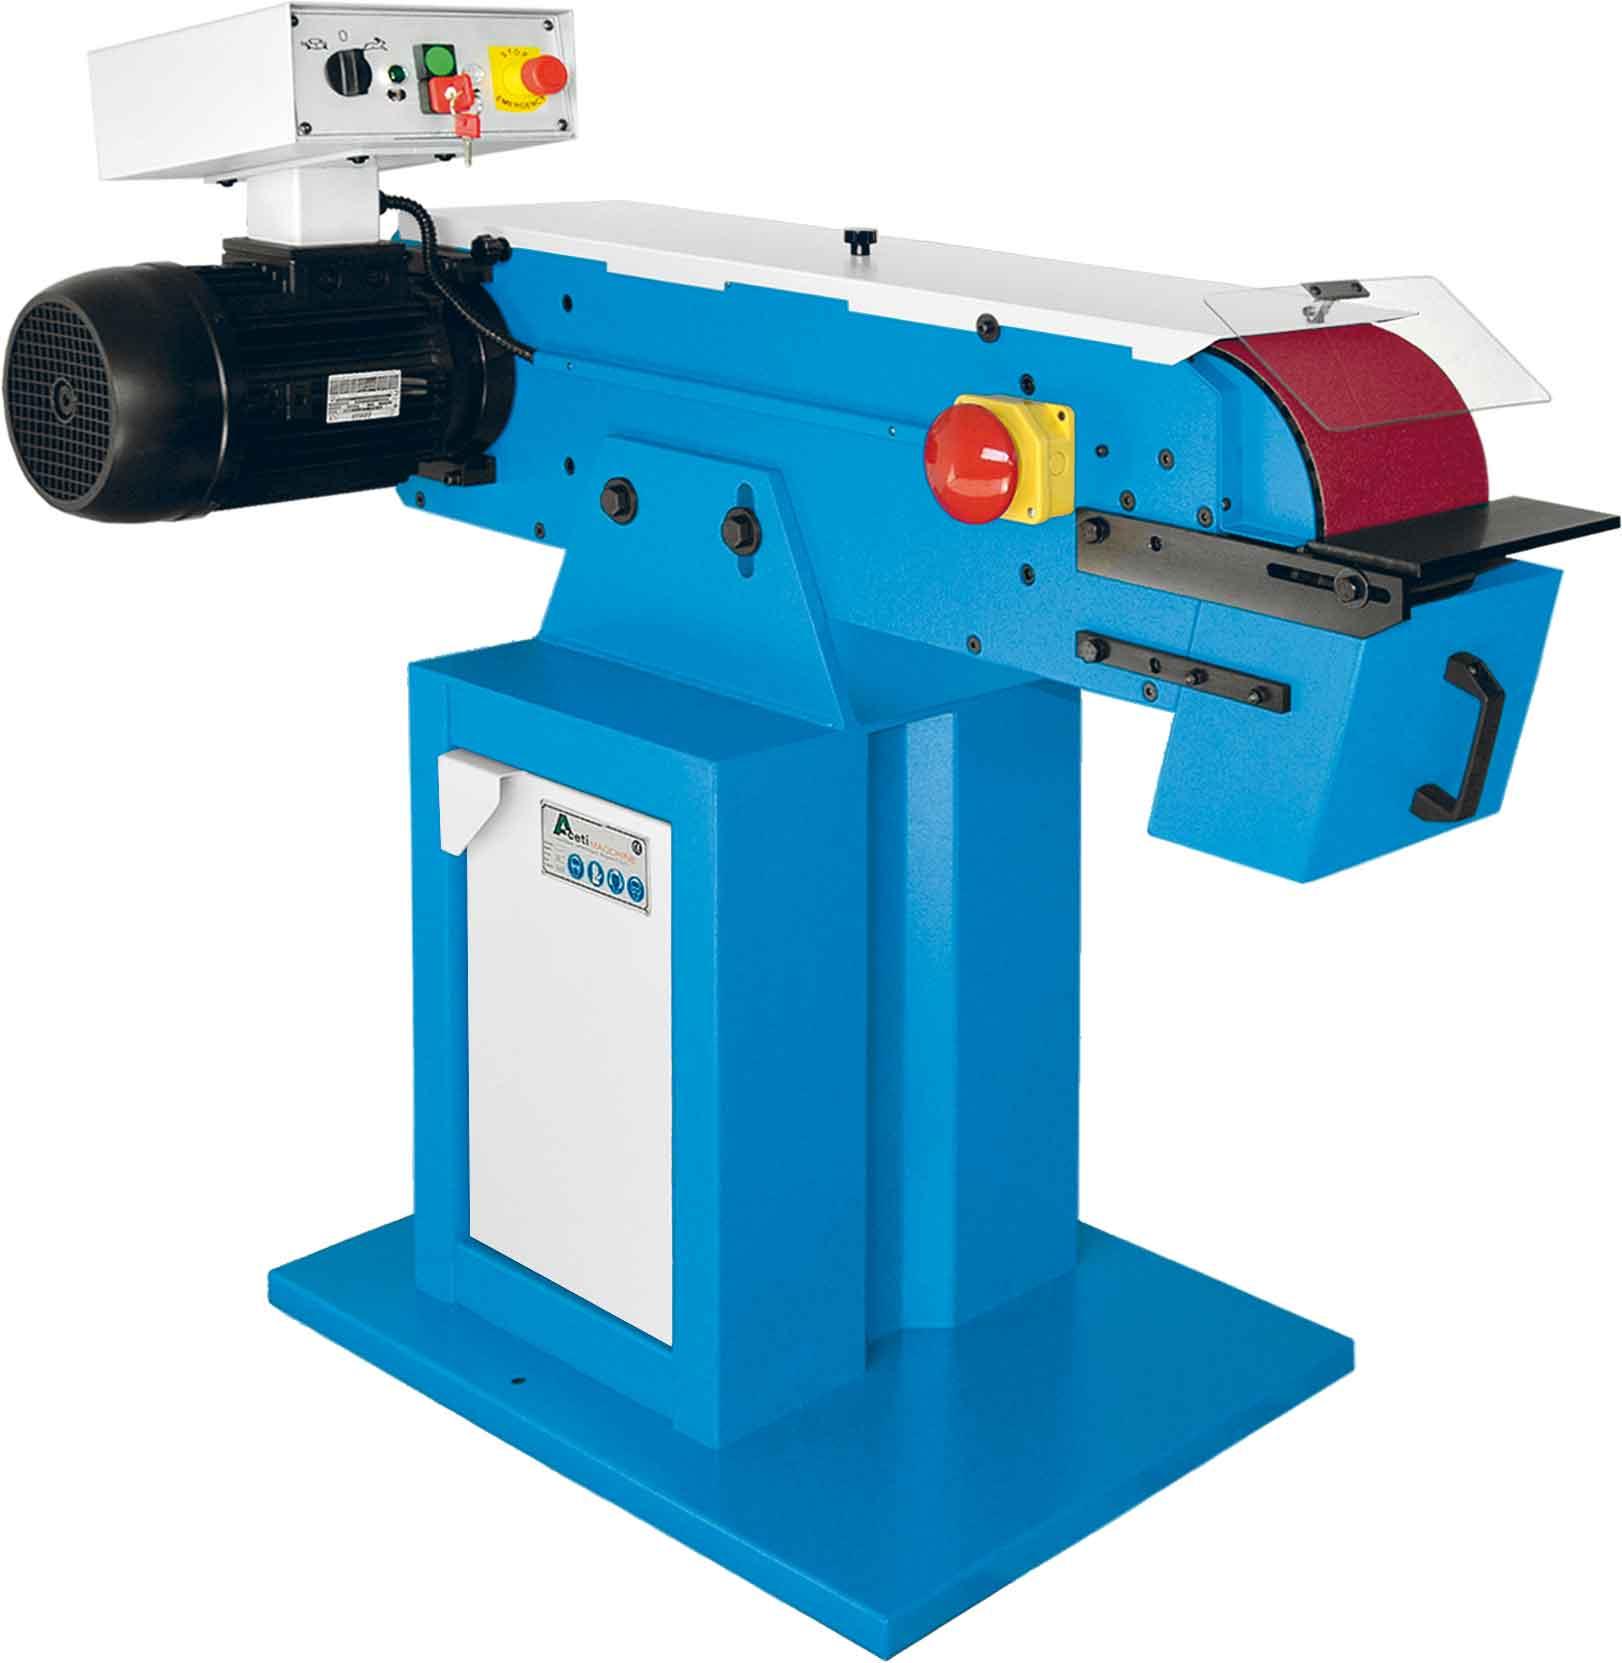 ART.90 - Belt grinding machine